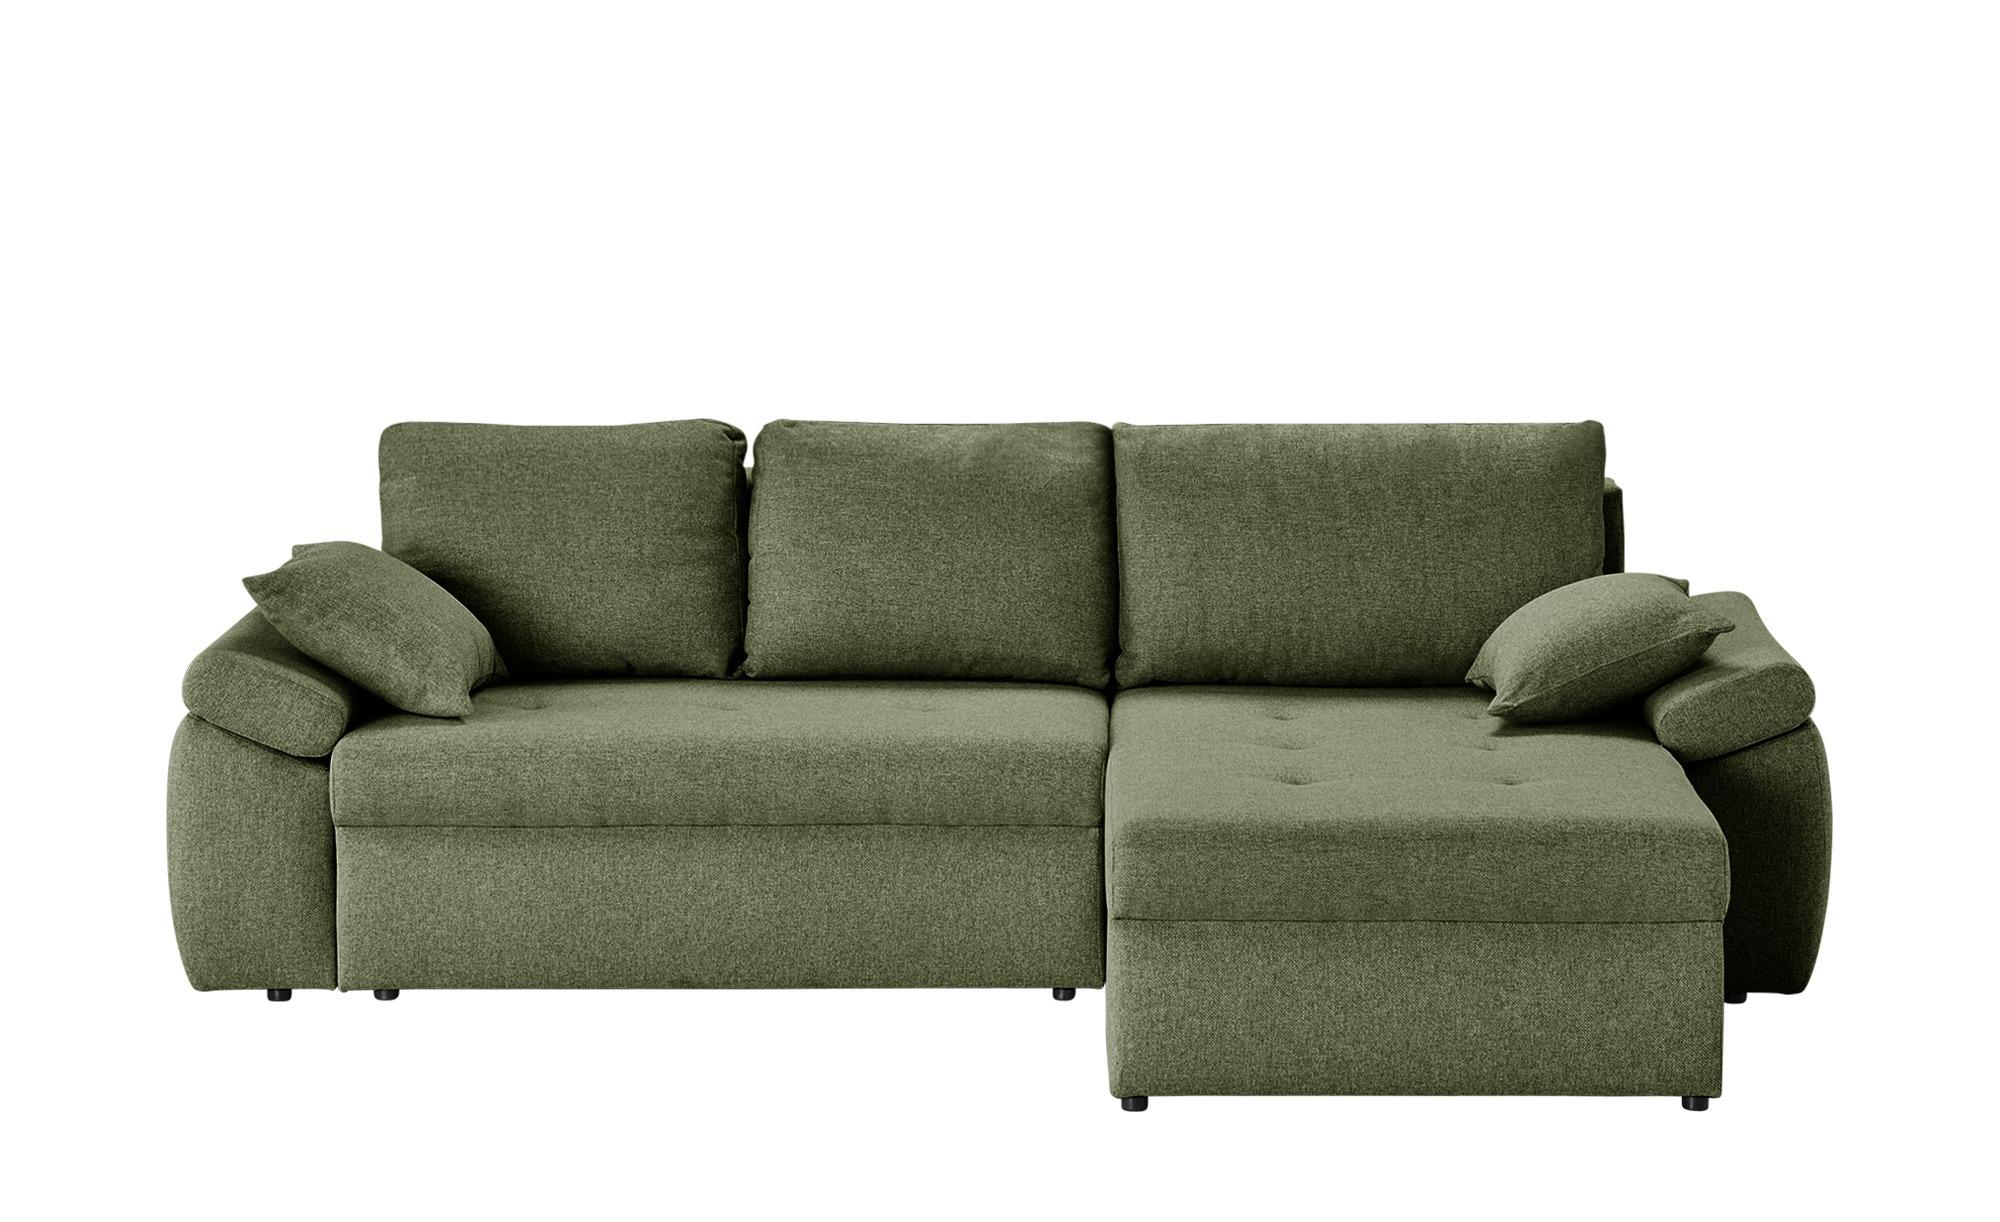 Ecksofa  Leonie ¦ grün ¦ Maße (cm): B: 220 H: 85 T: 160 Polstermöbel > Sofas > Ecksofas - Höffner